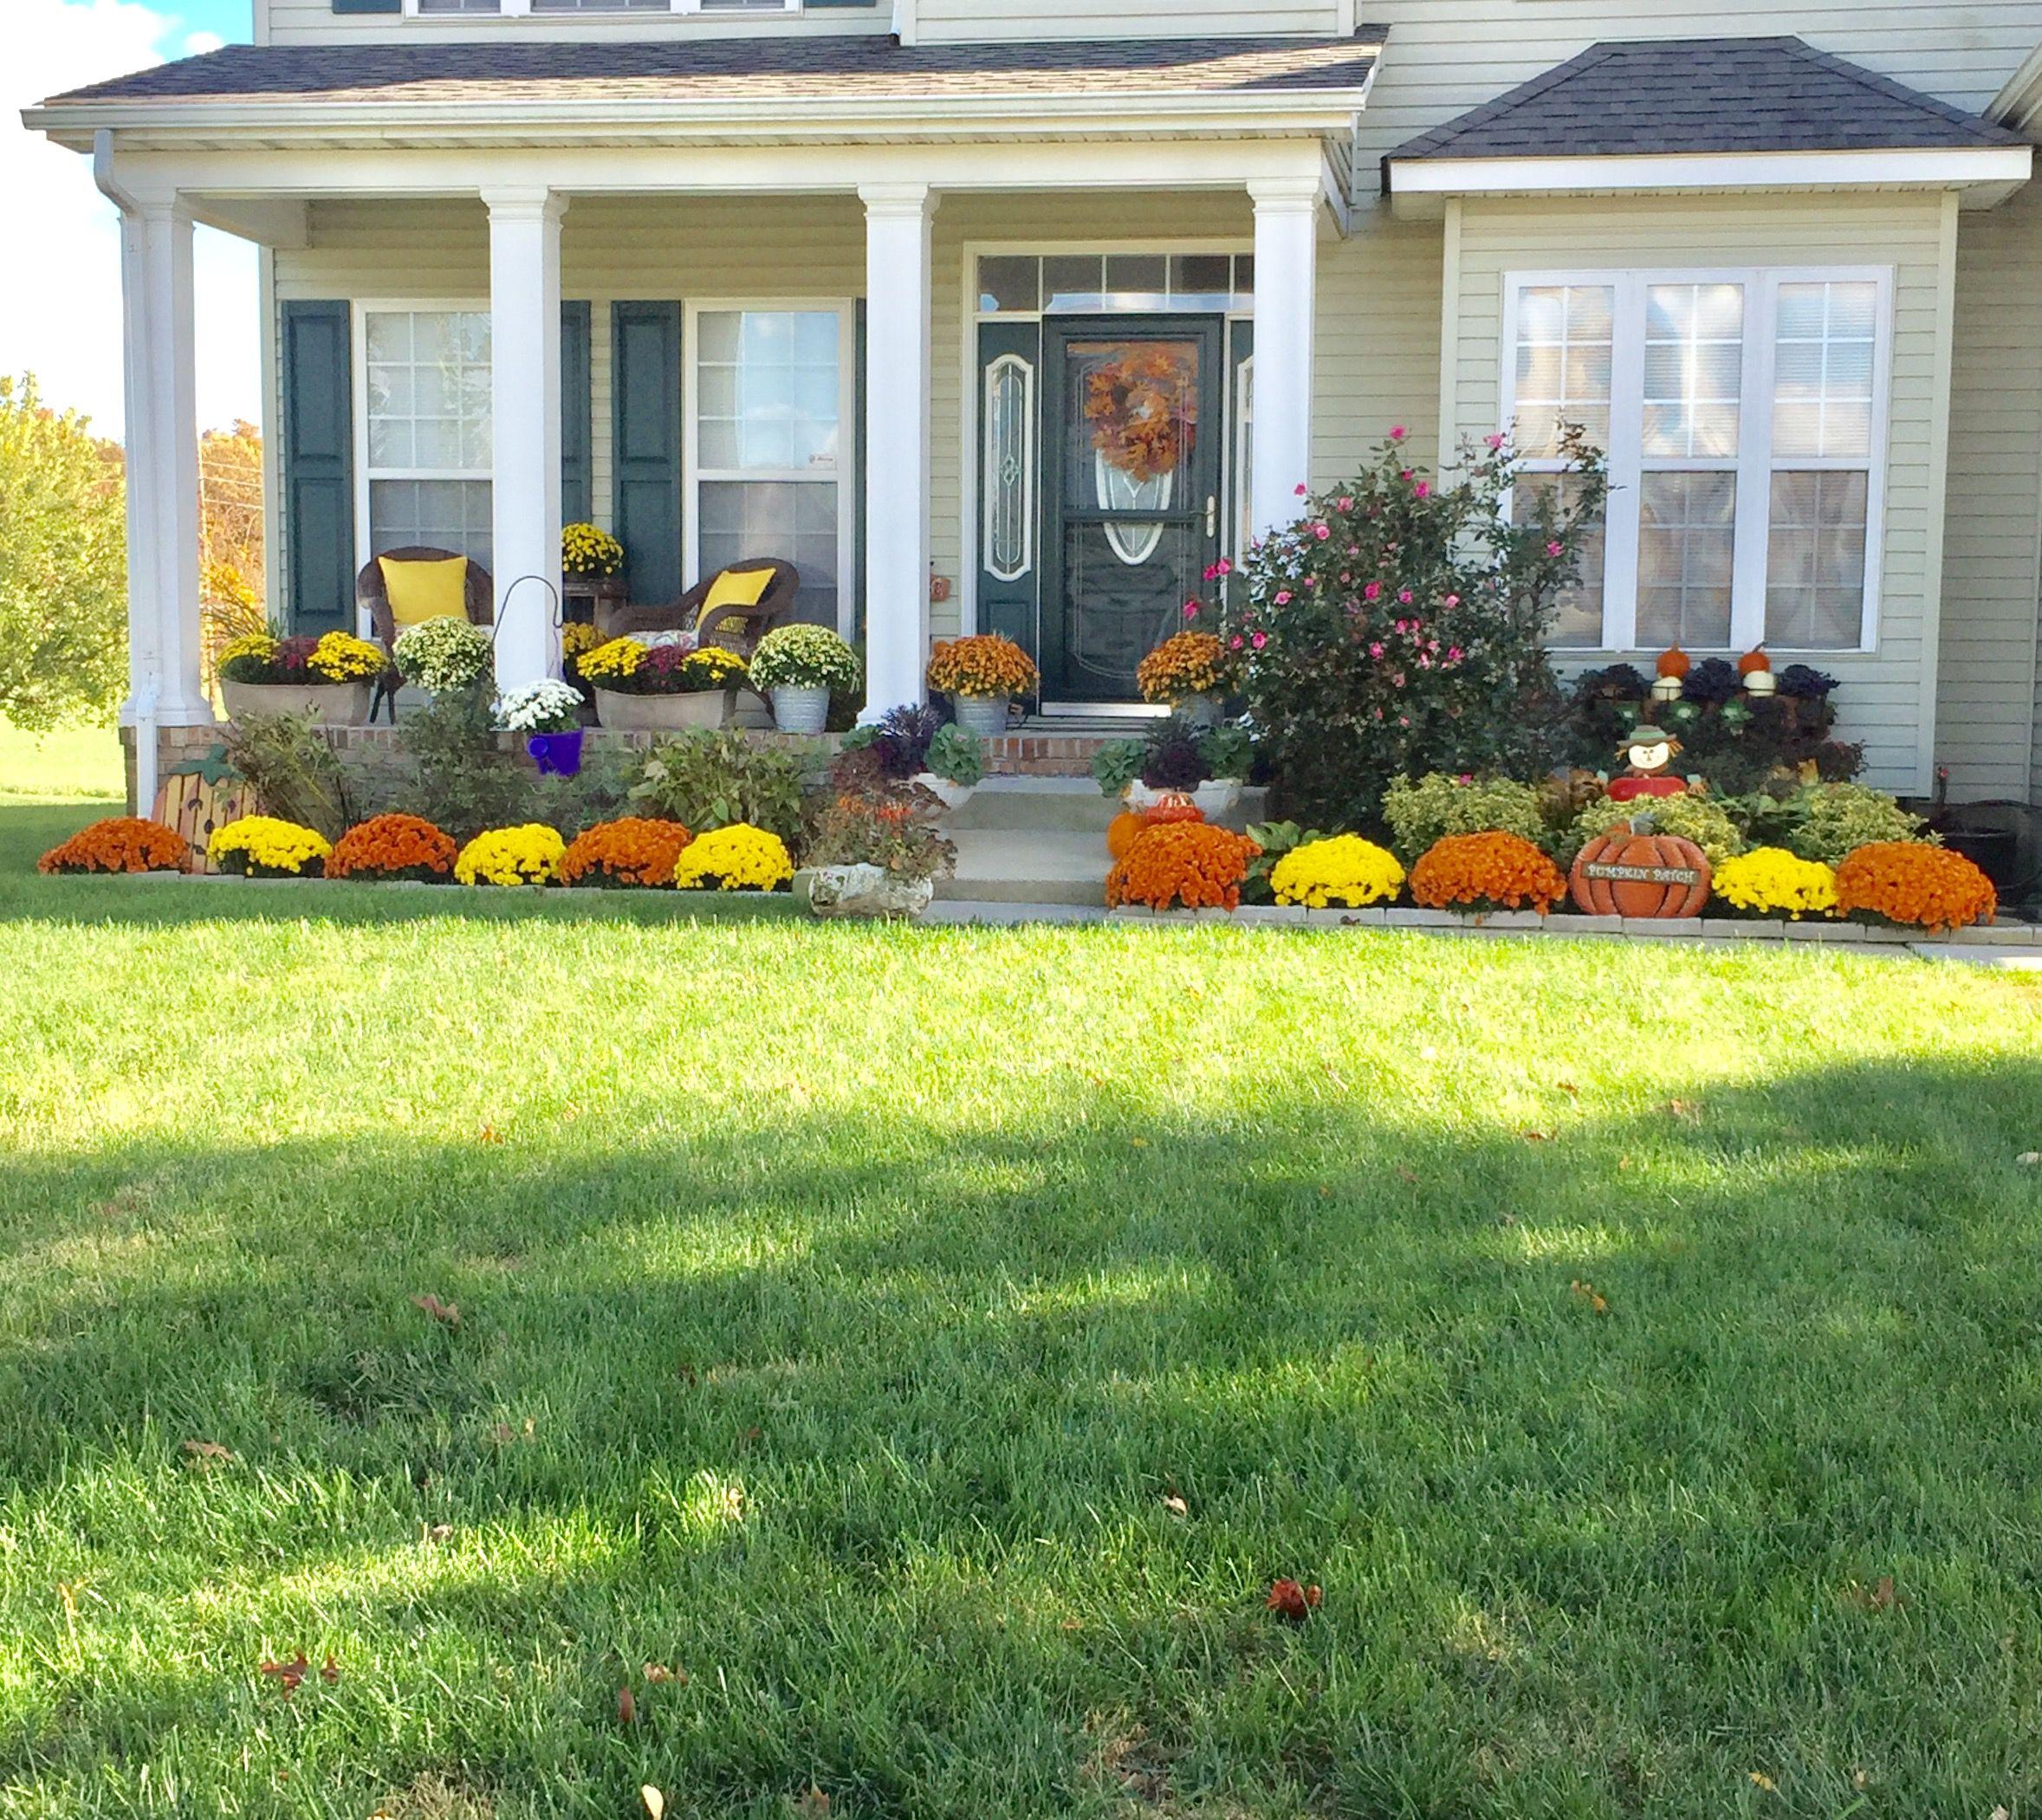 Fall Front Yard Mums, Pumpkins And Ornamental Cabbage